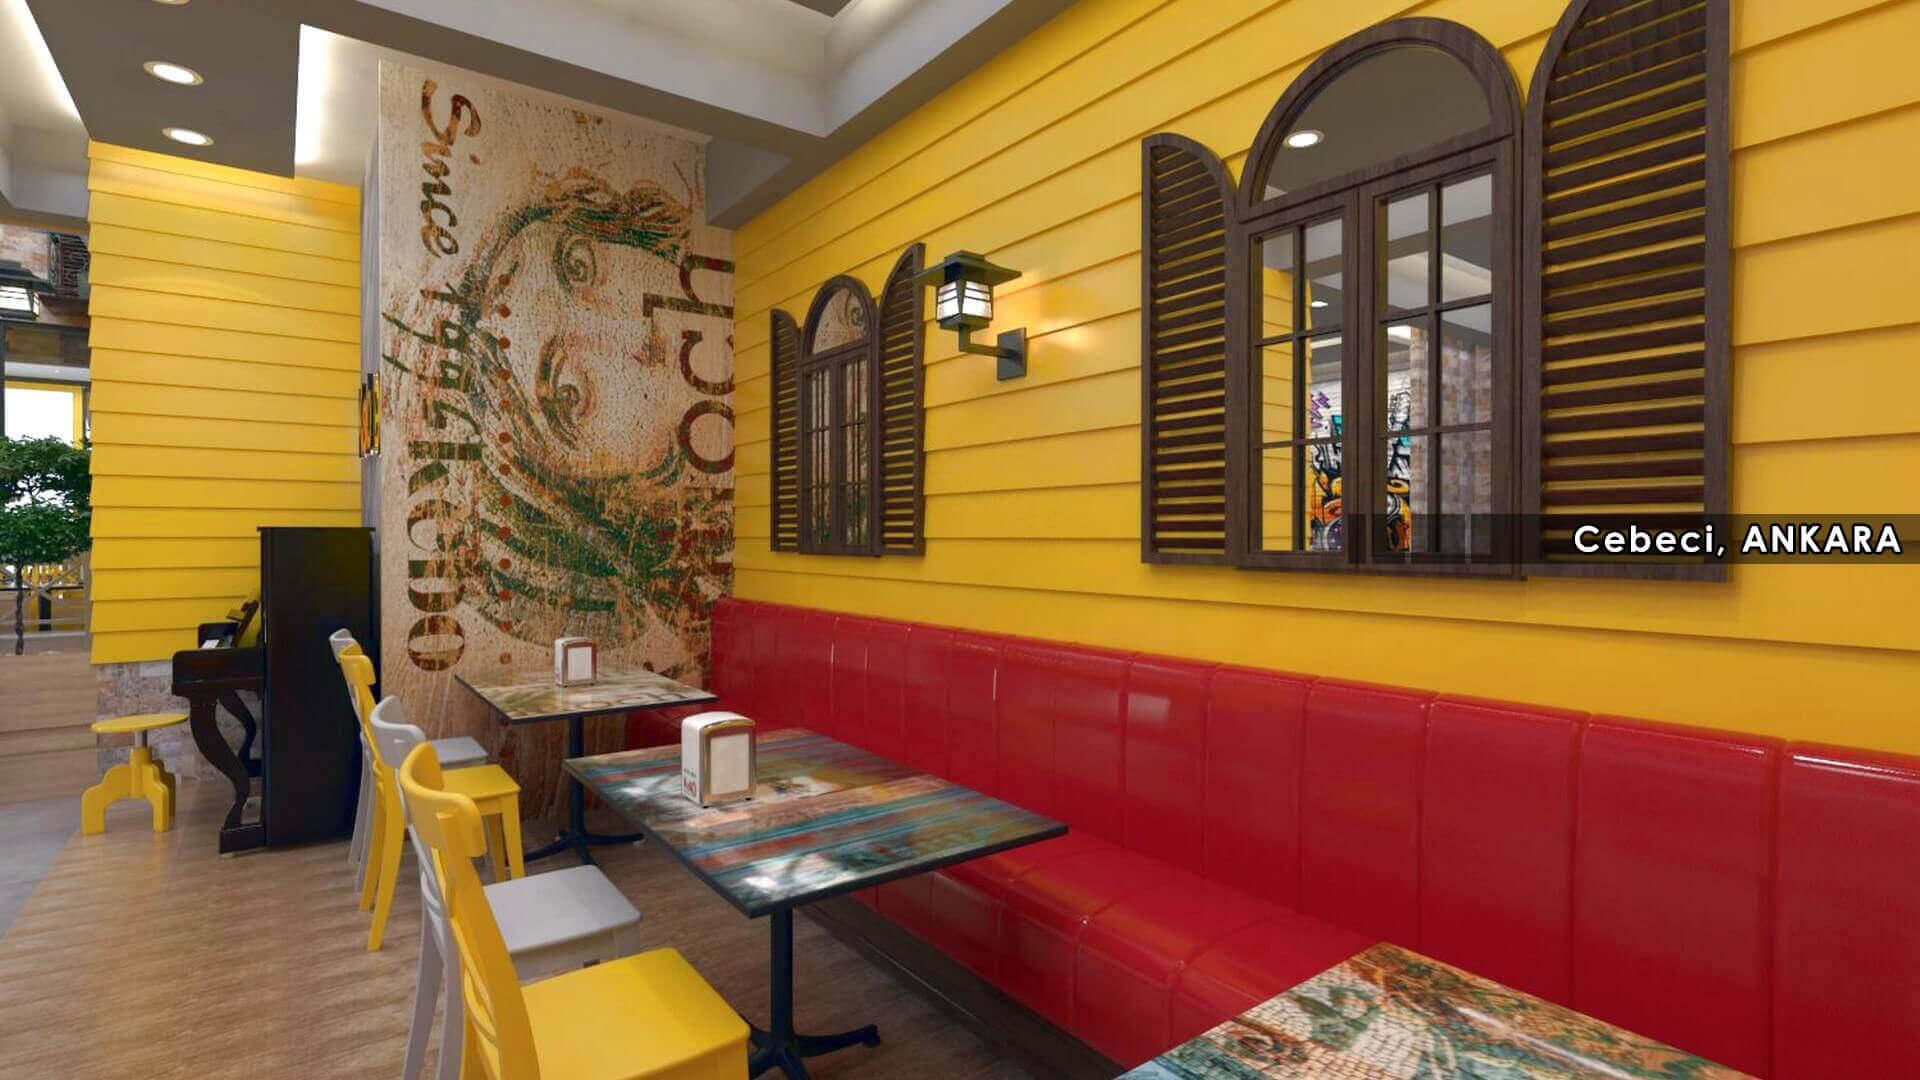 Restoran tasarımı 2131 Kebo 2018 Restoranlar